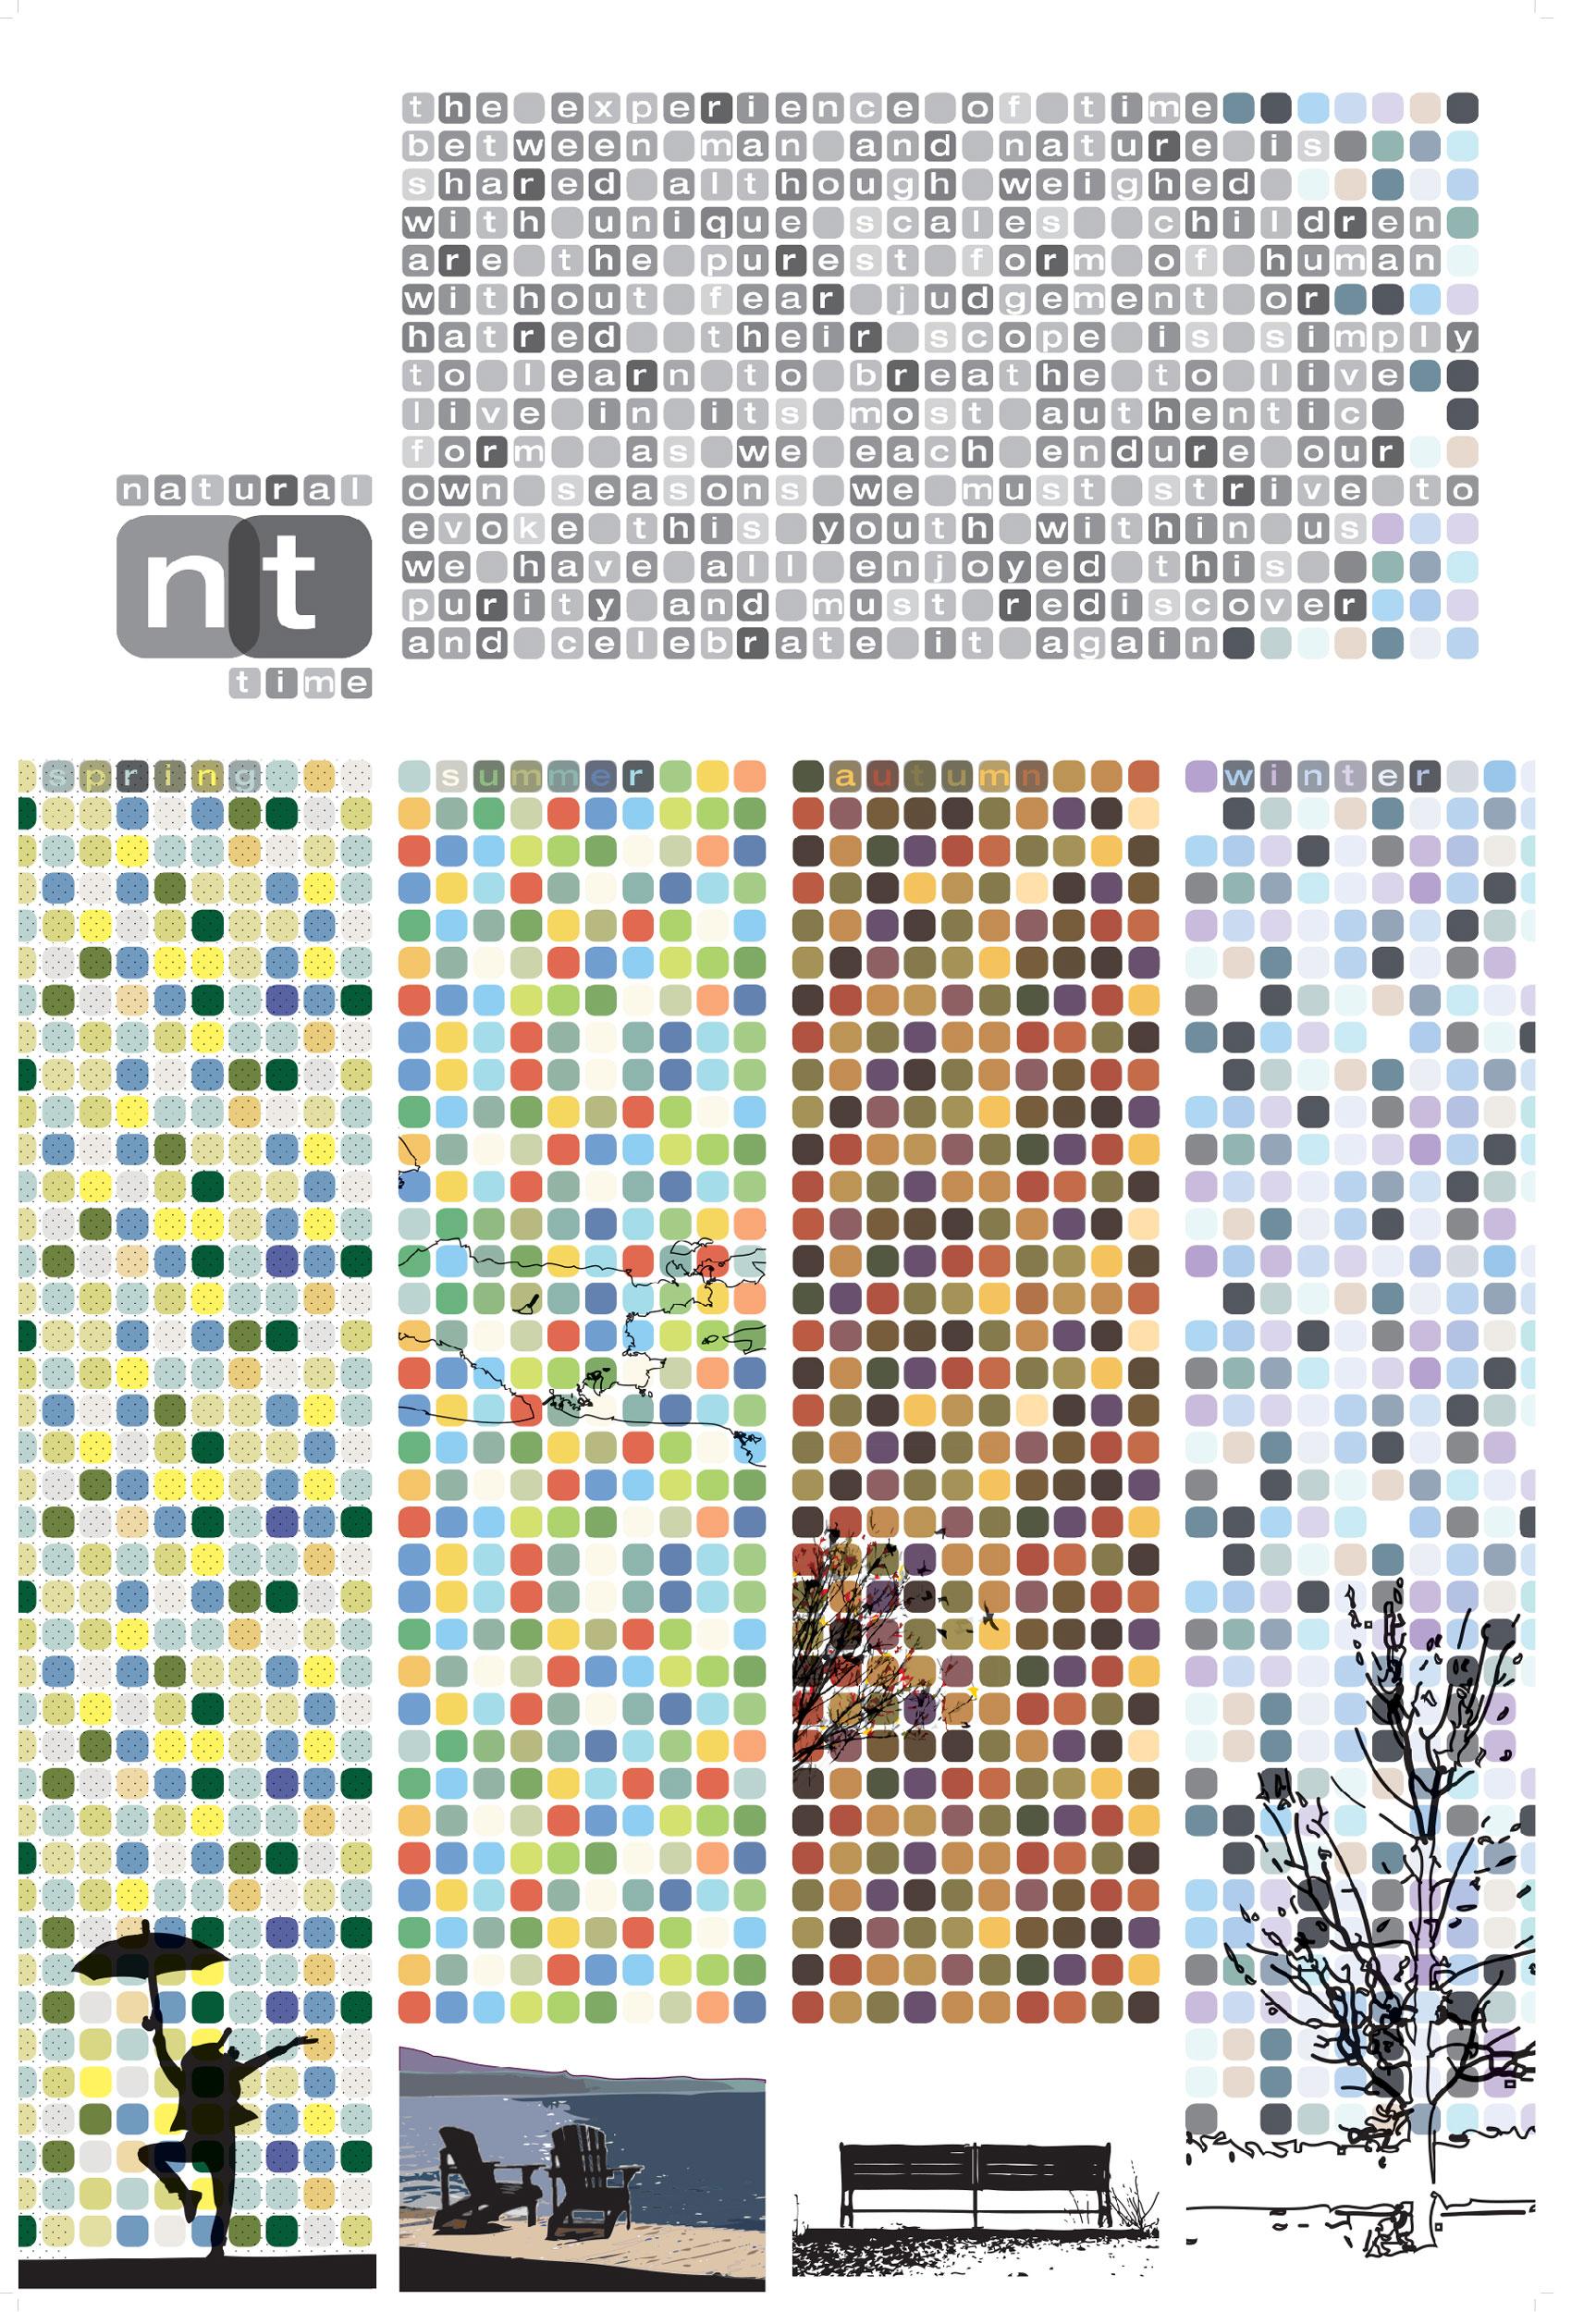 graphic-design-08.jpg